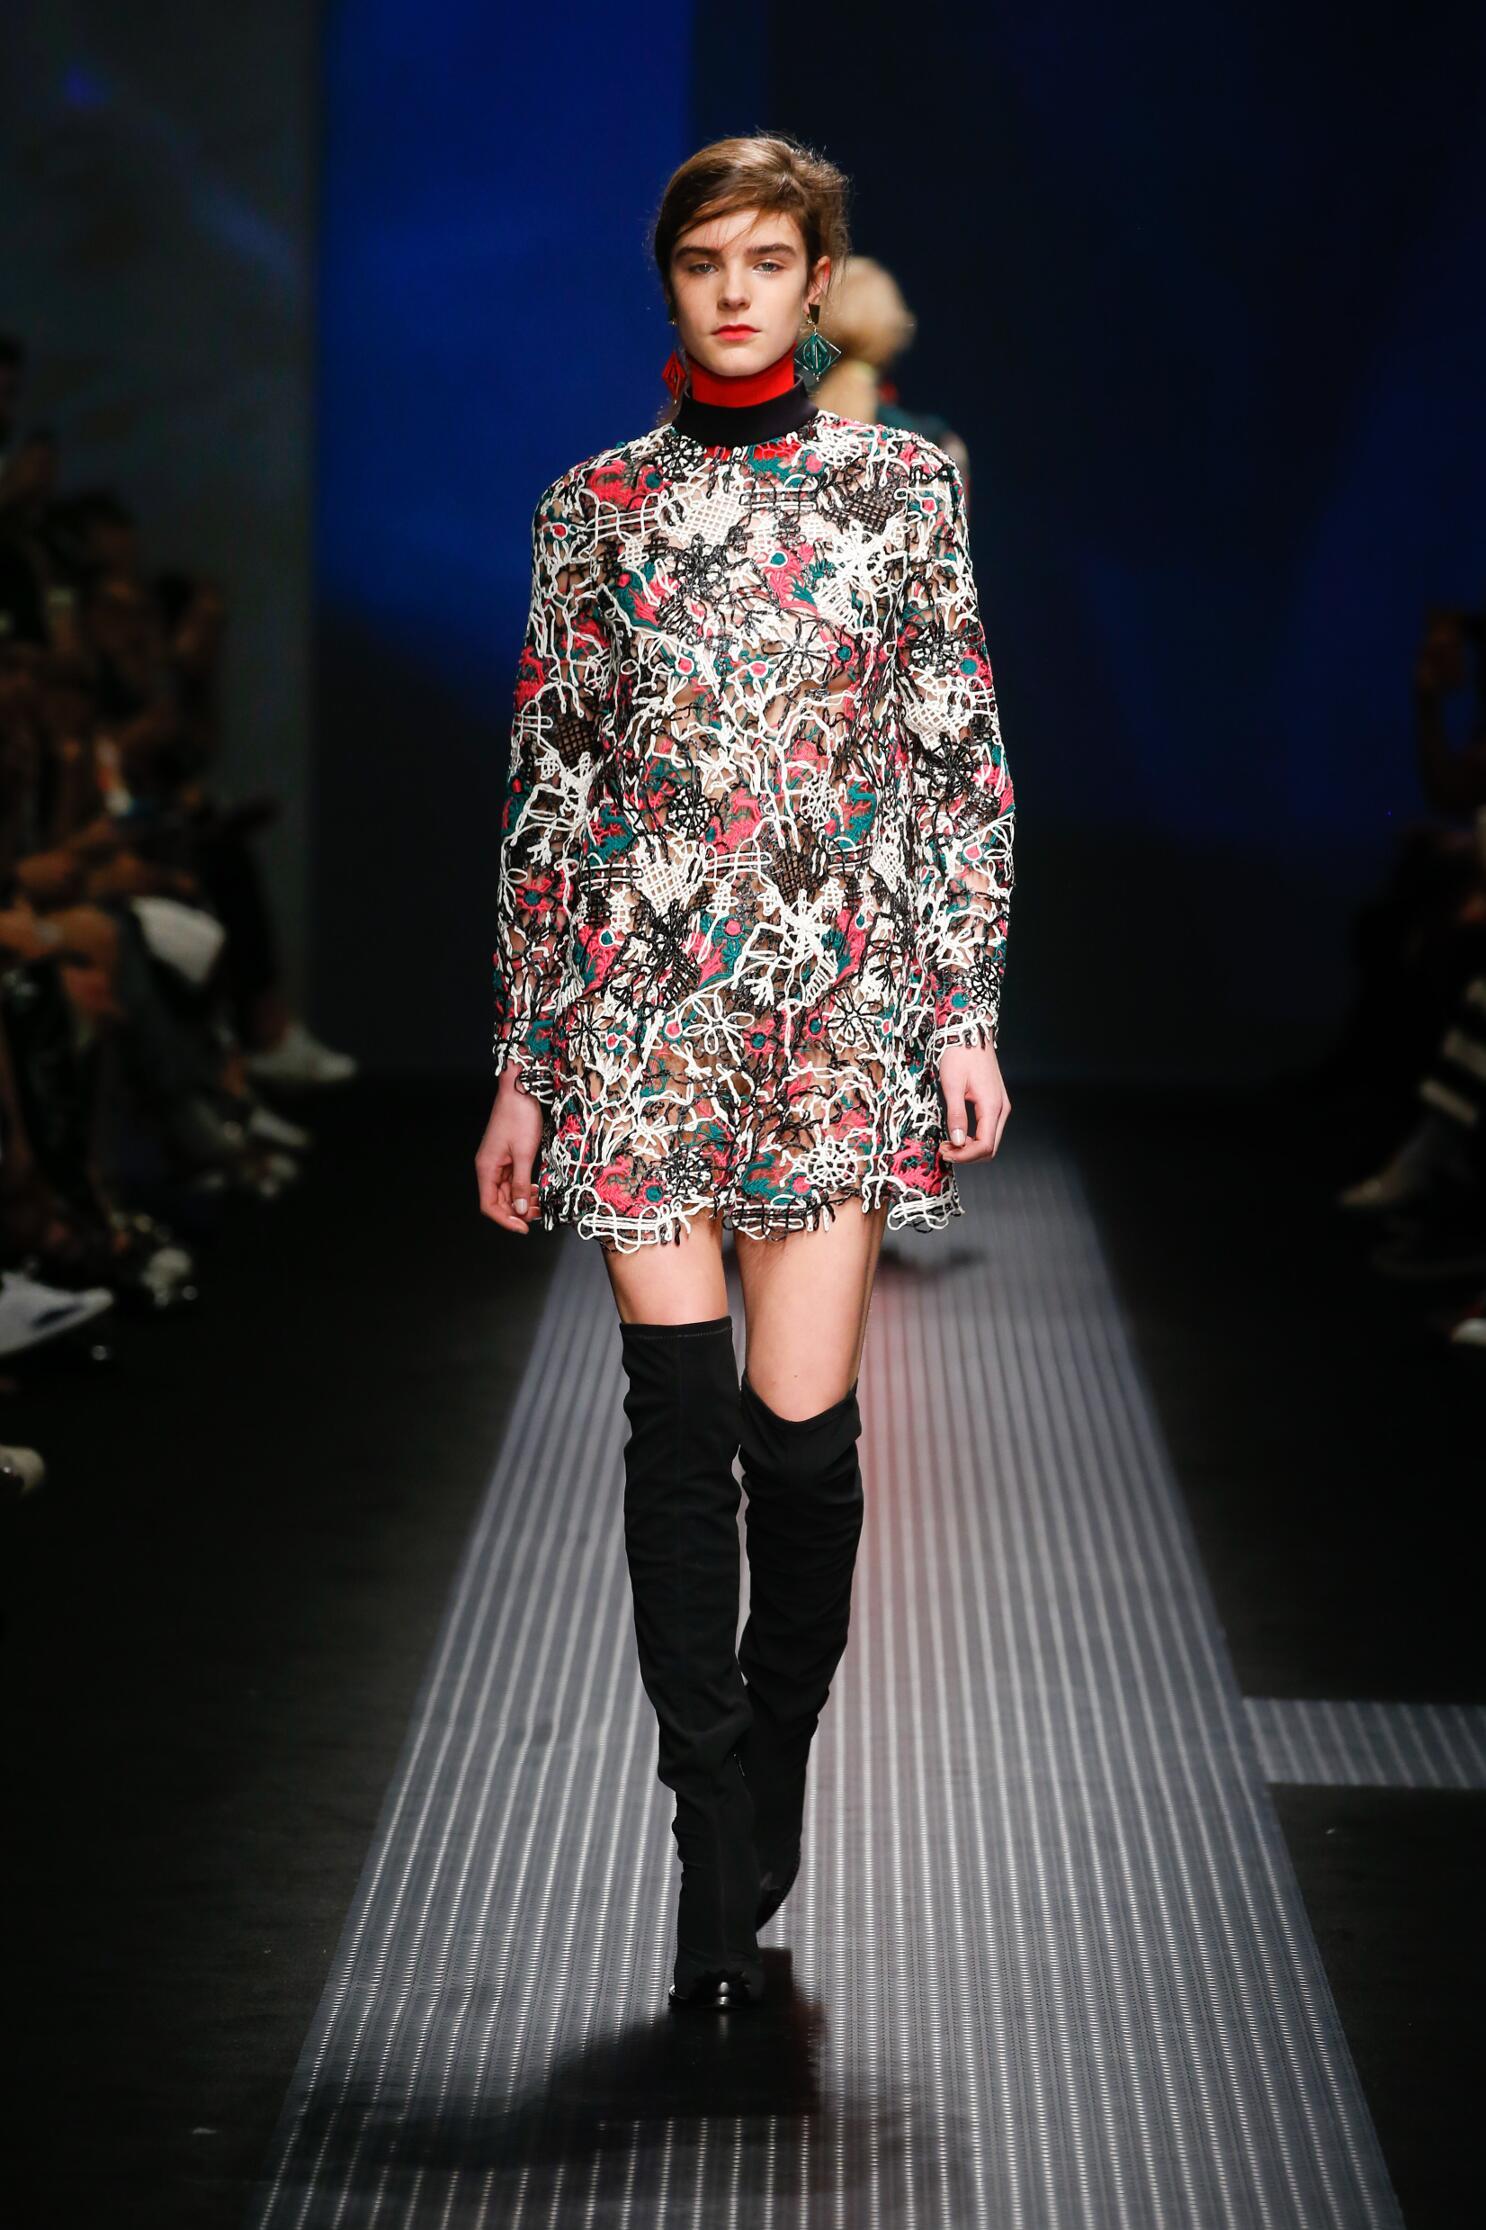 Runway Msgm Fall Winter 2015 16 Women's Collection Milan Fashion Week